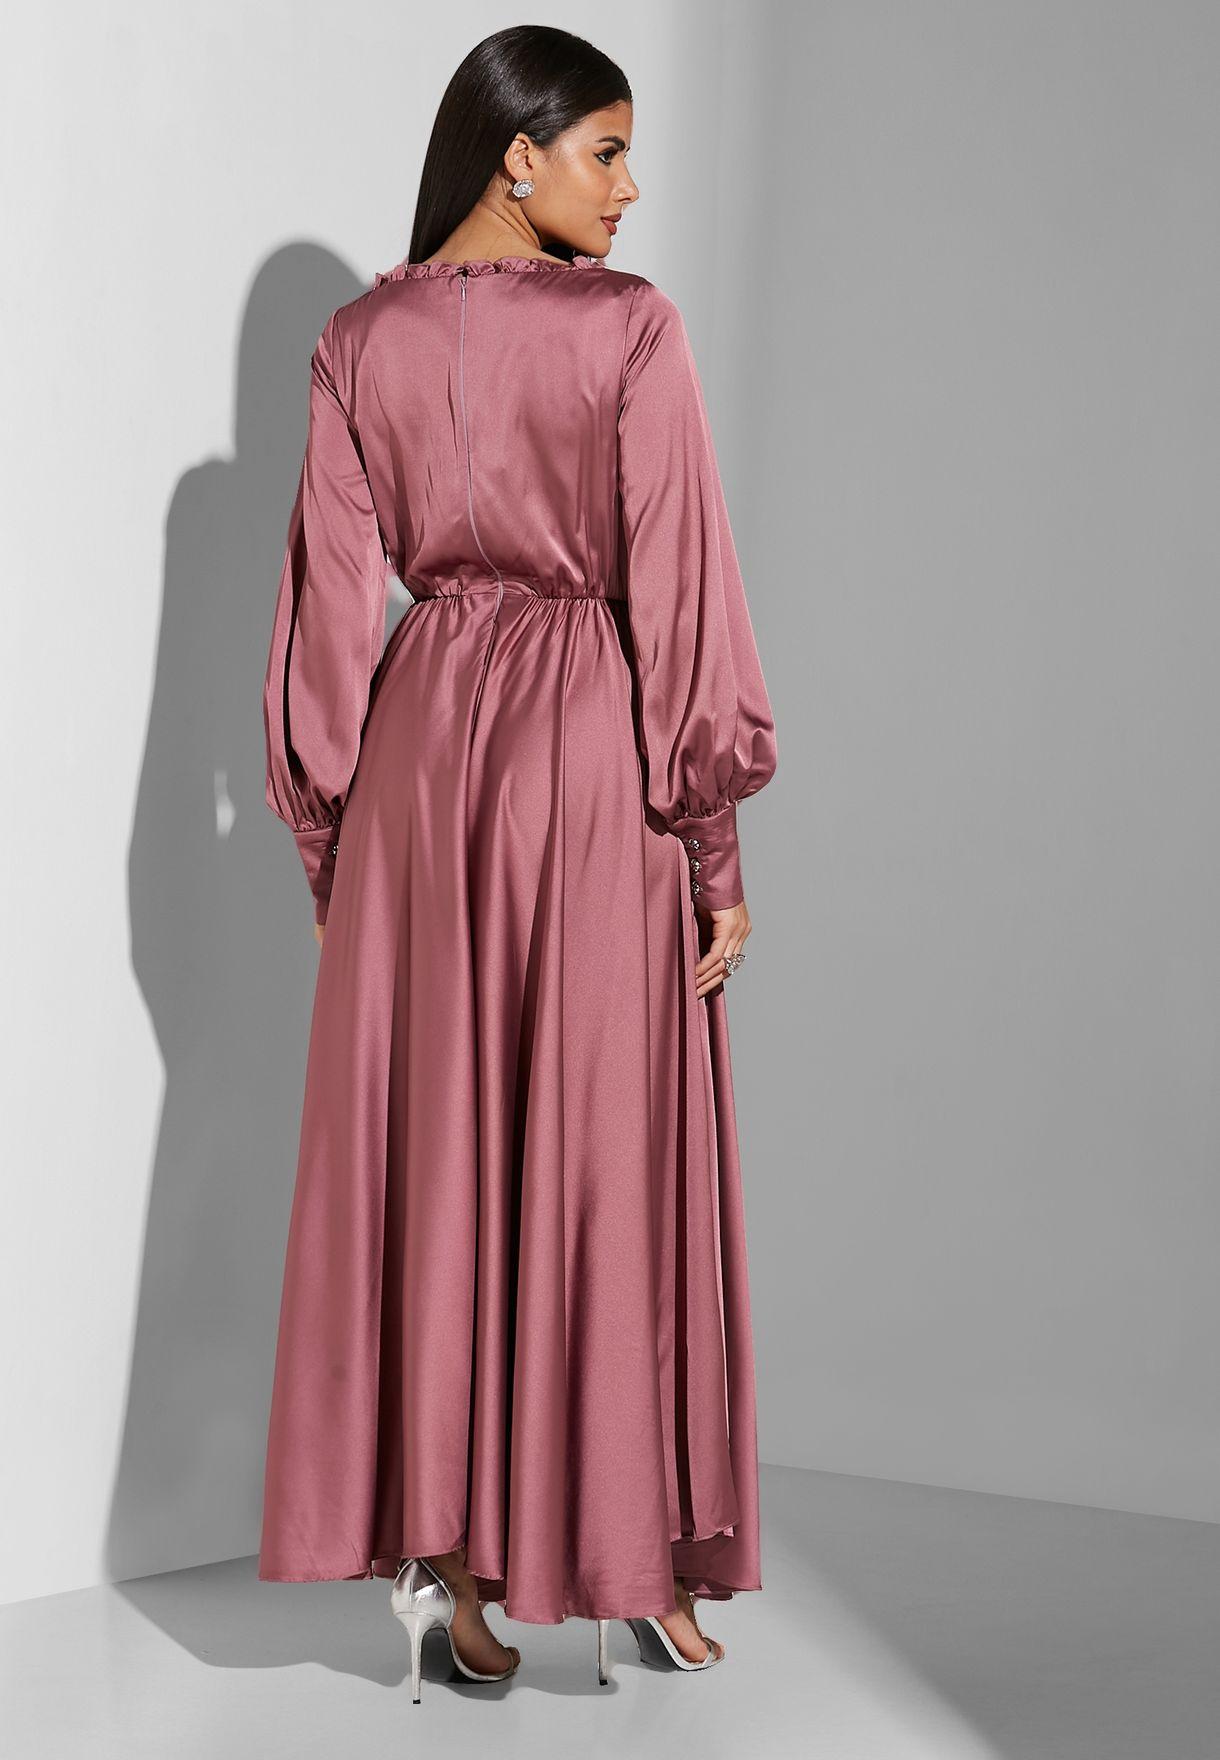 Puffy Sleeved Dress